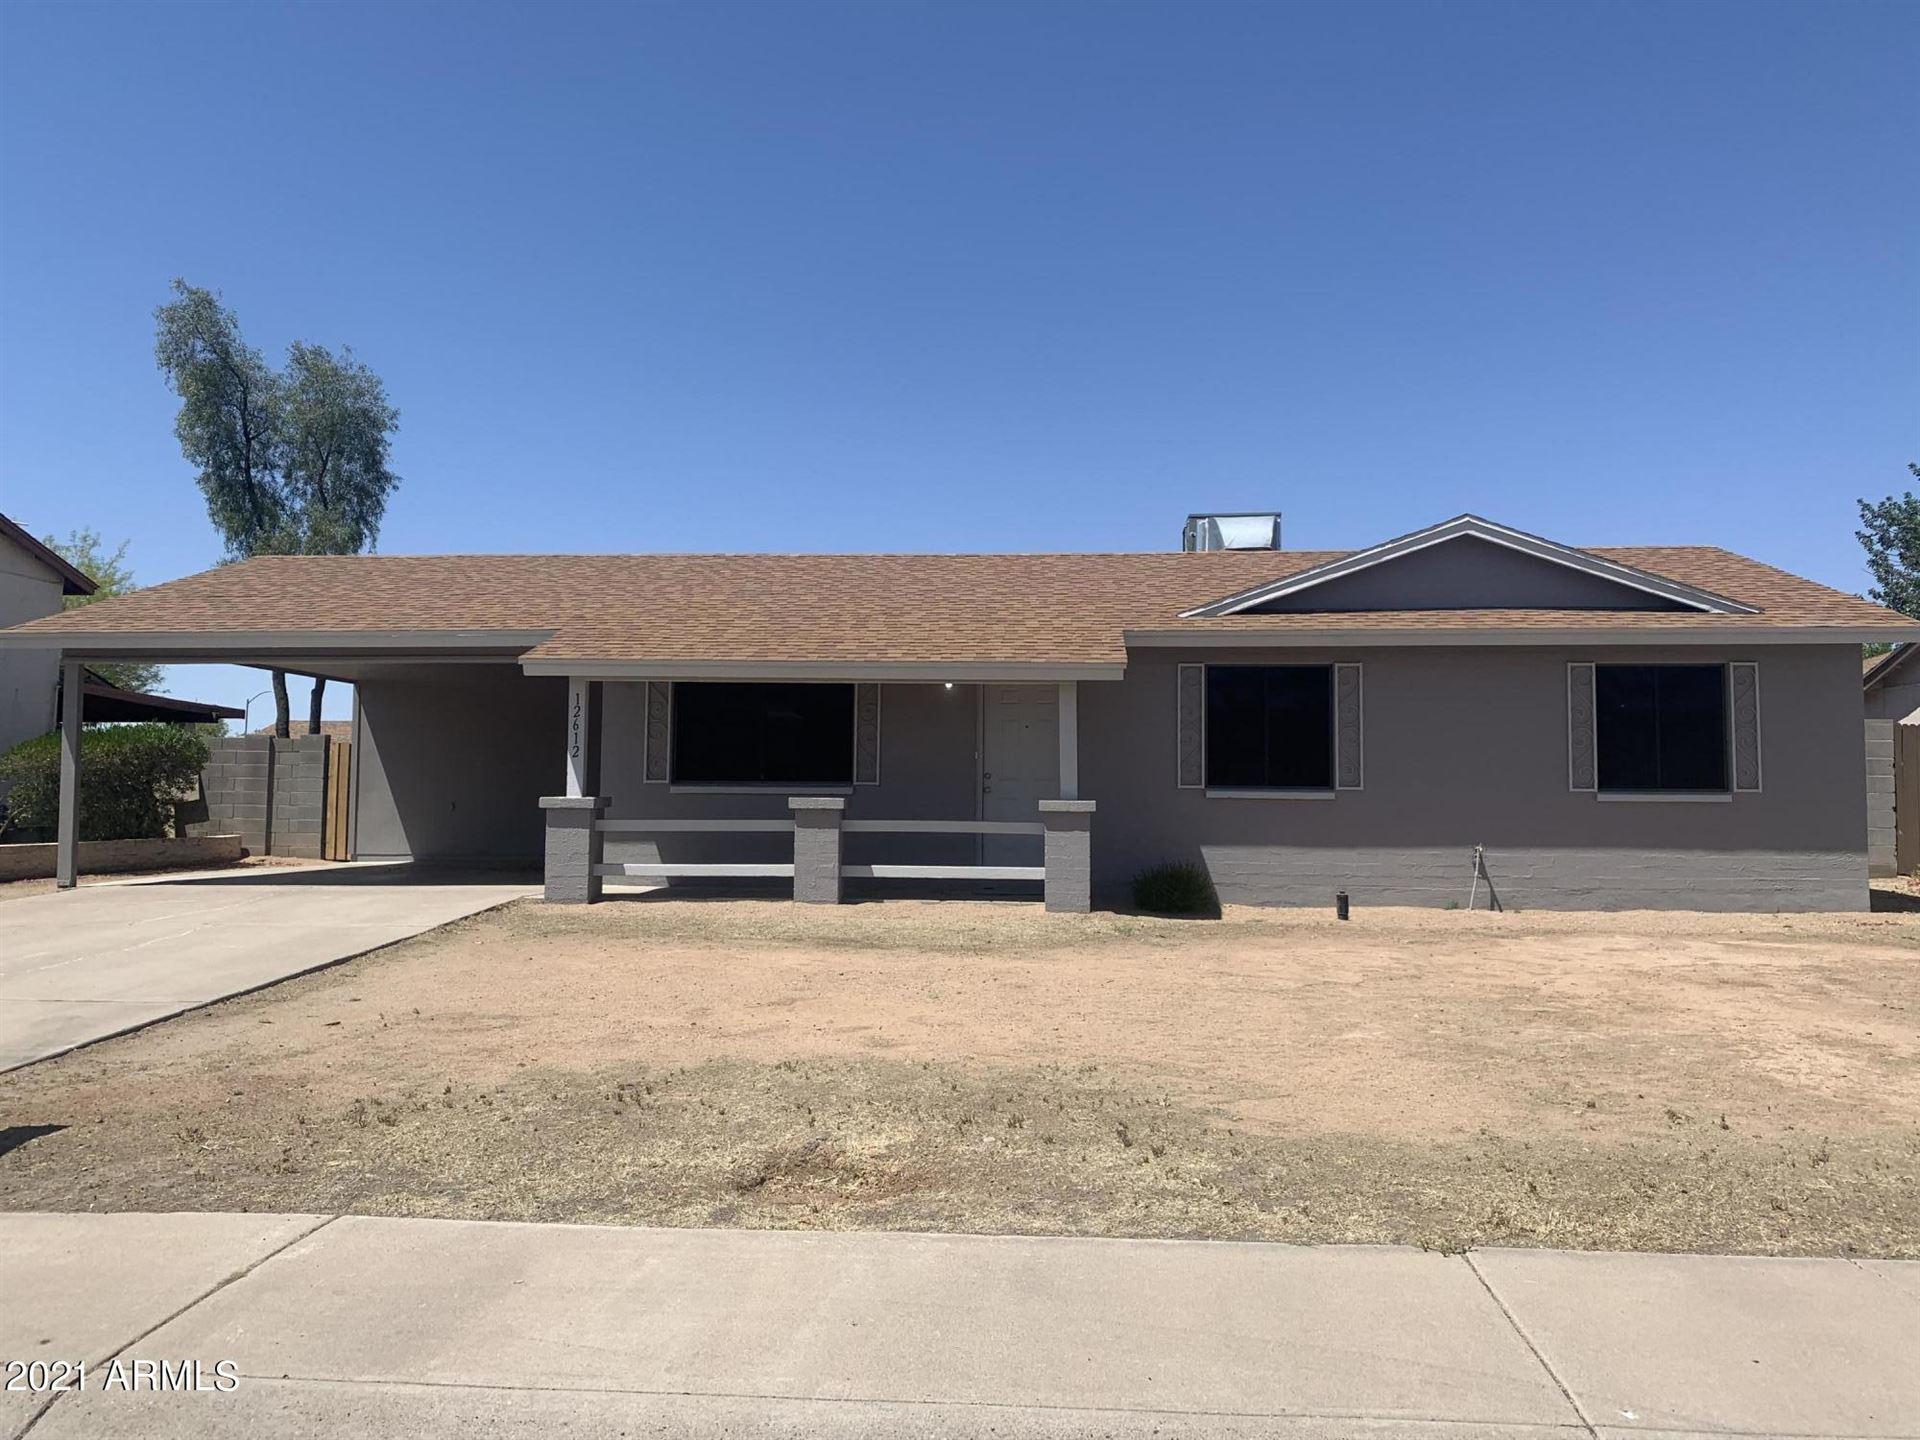 12612 N 37TH Avenue, Phoenix, AZ 85029 - MLS#: 6228822